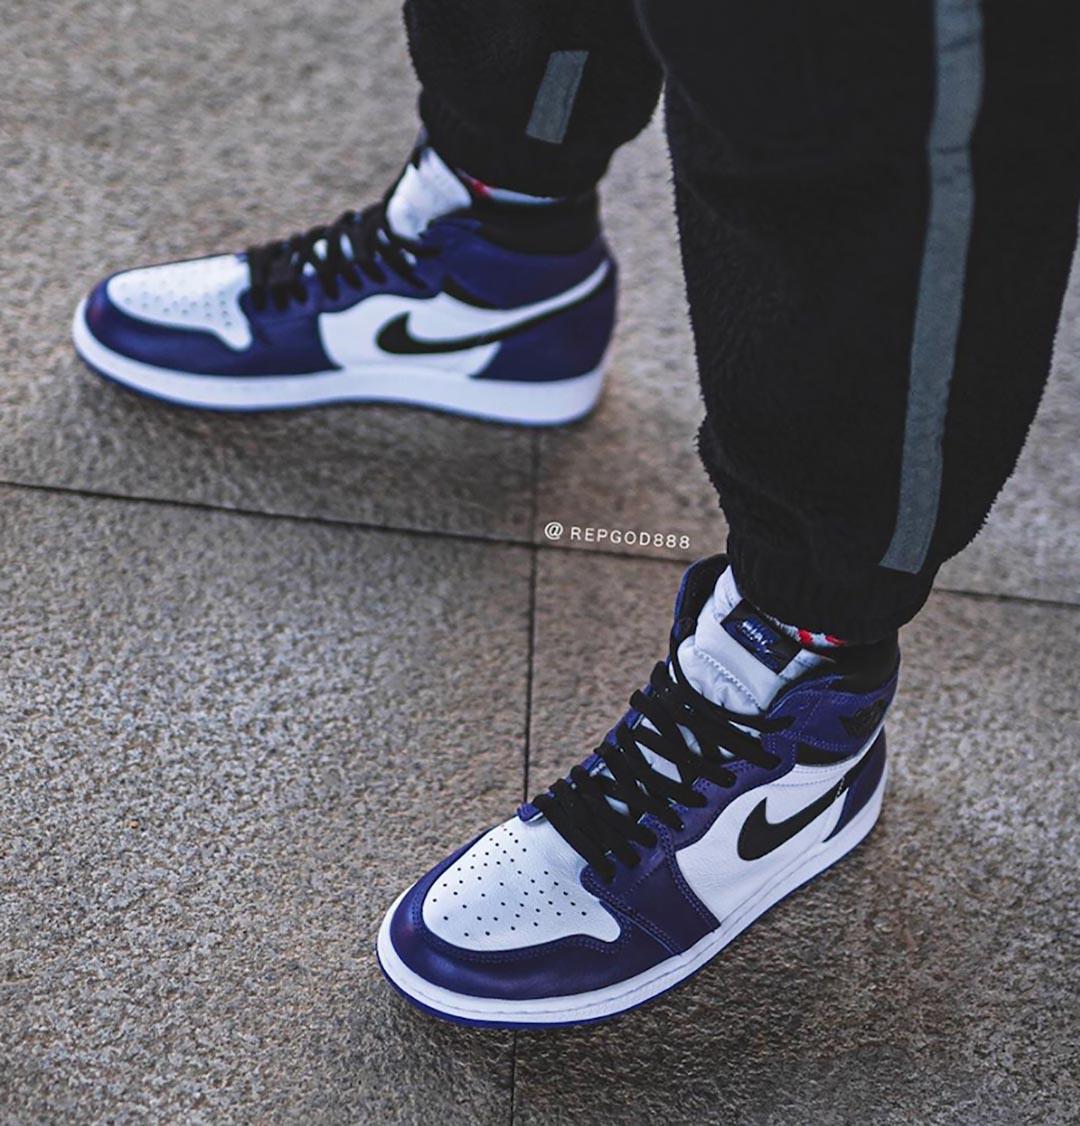 air-jordan-1-retro-hi-og-court-purple-white-black-555088-500-release-date-29